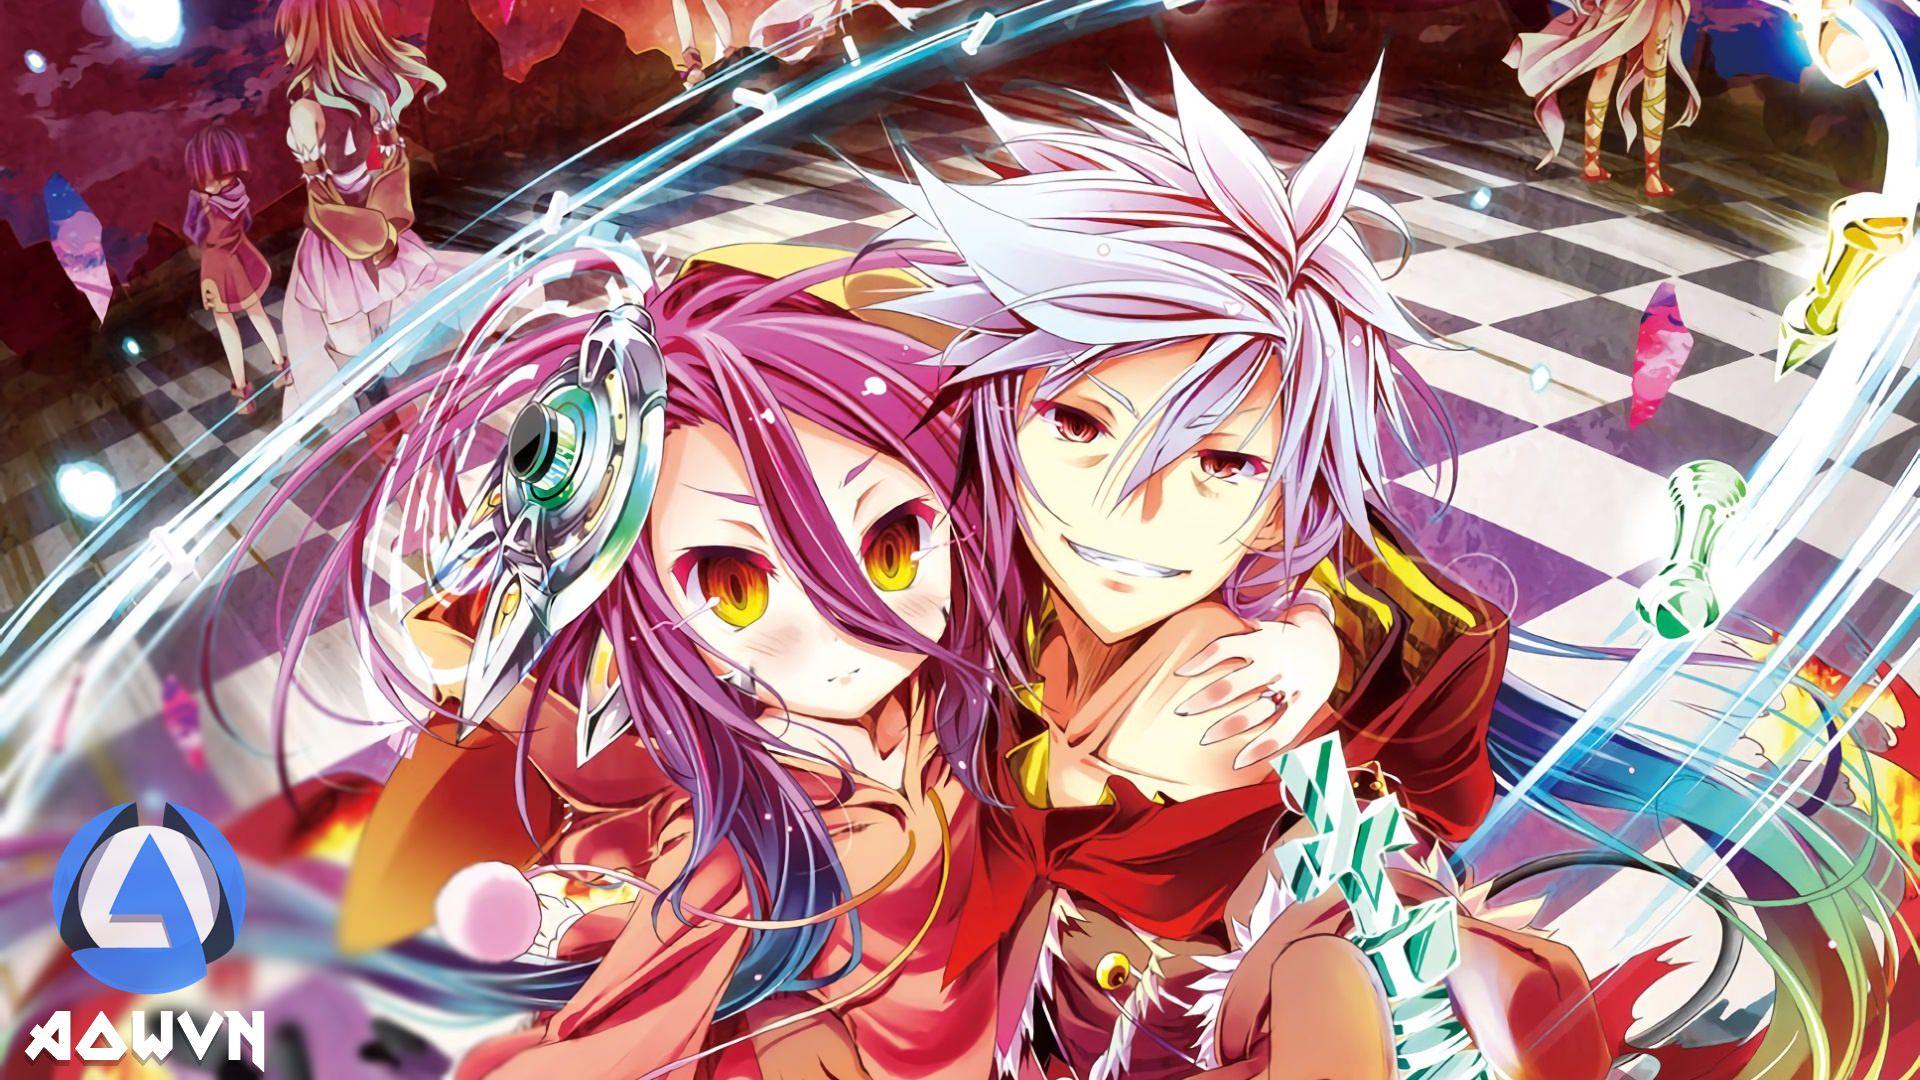 0RMfZrB - [ Anime 3gp Mp4 ] NO GAME NO LIFE: ZERO | Vietsub - Siêu phẩm